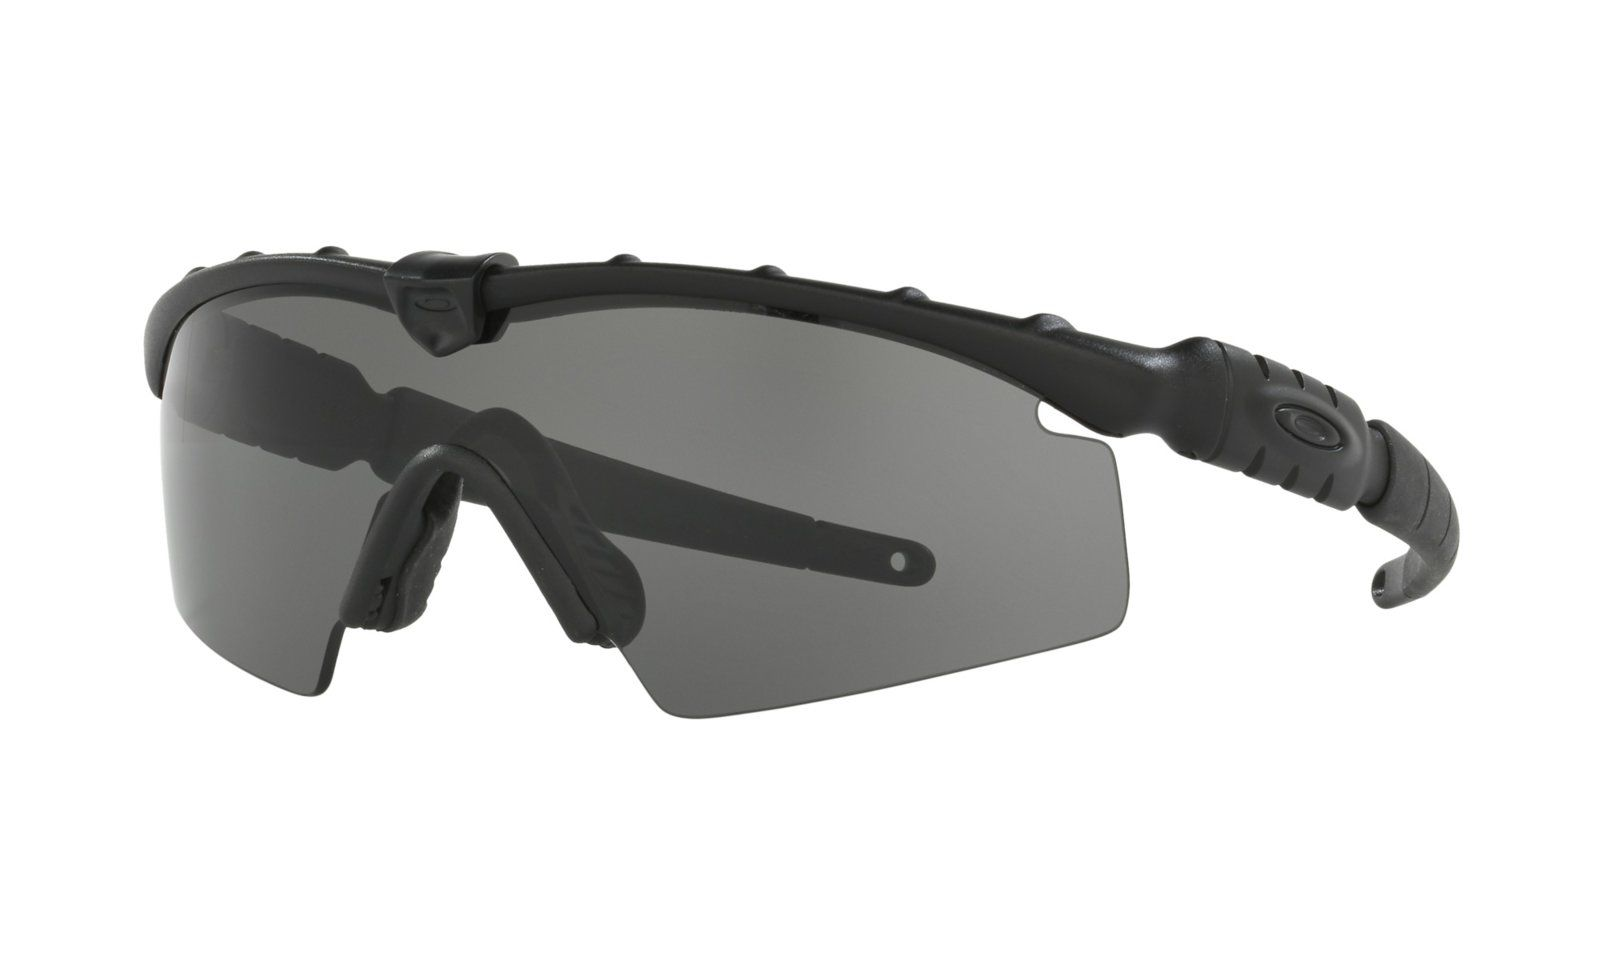 Buying - SI Ballistic M Frame 2.0 Earsock kits | Oakley Forum